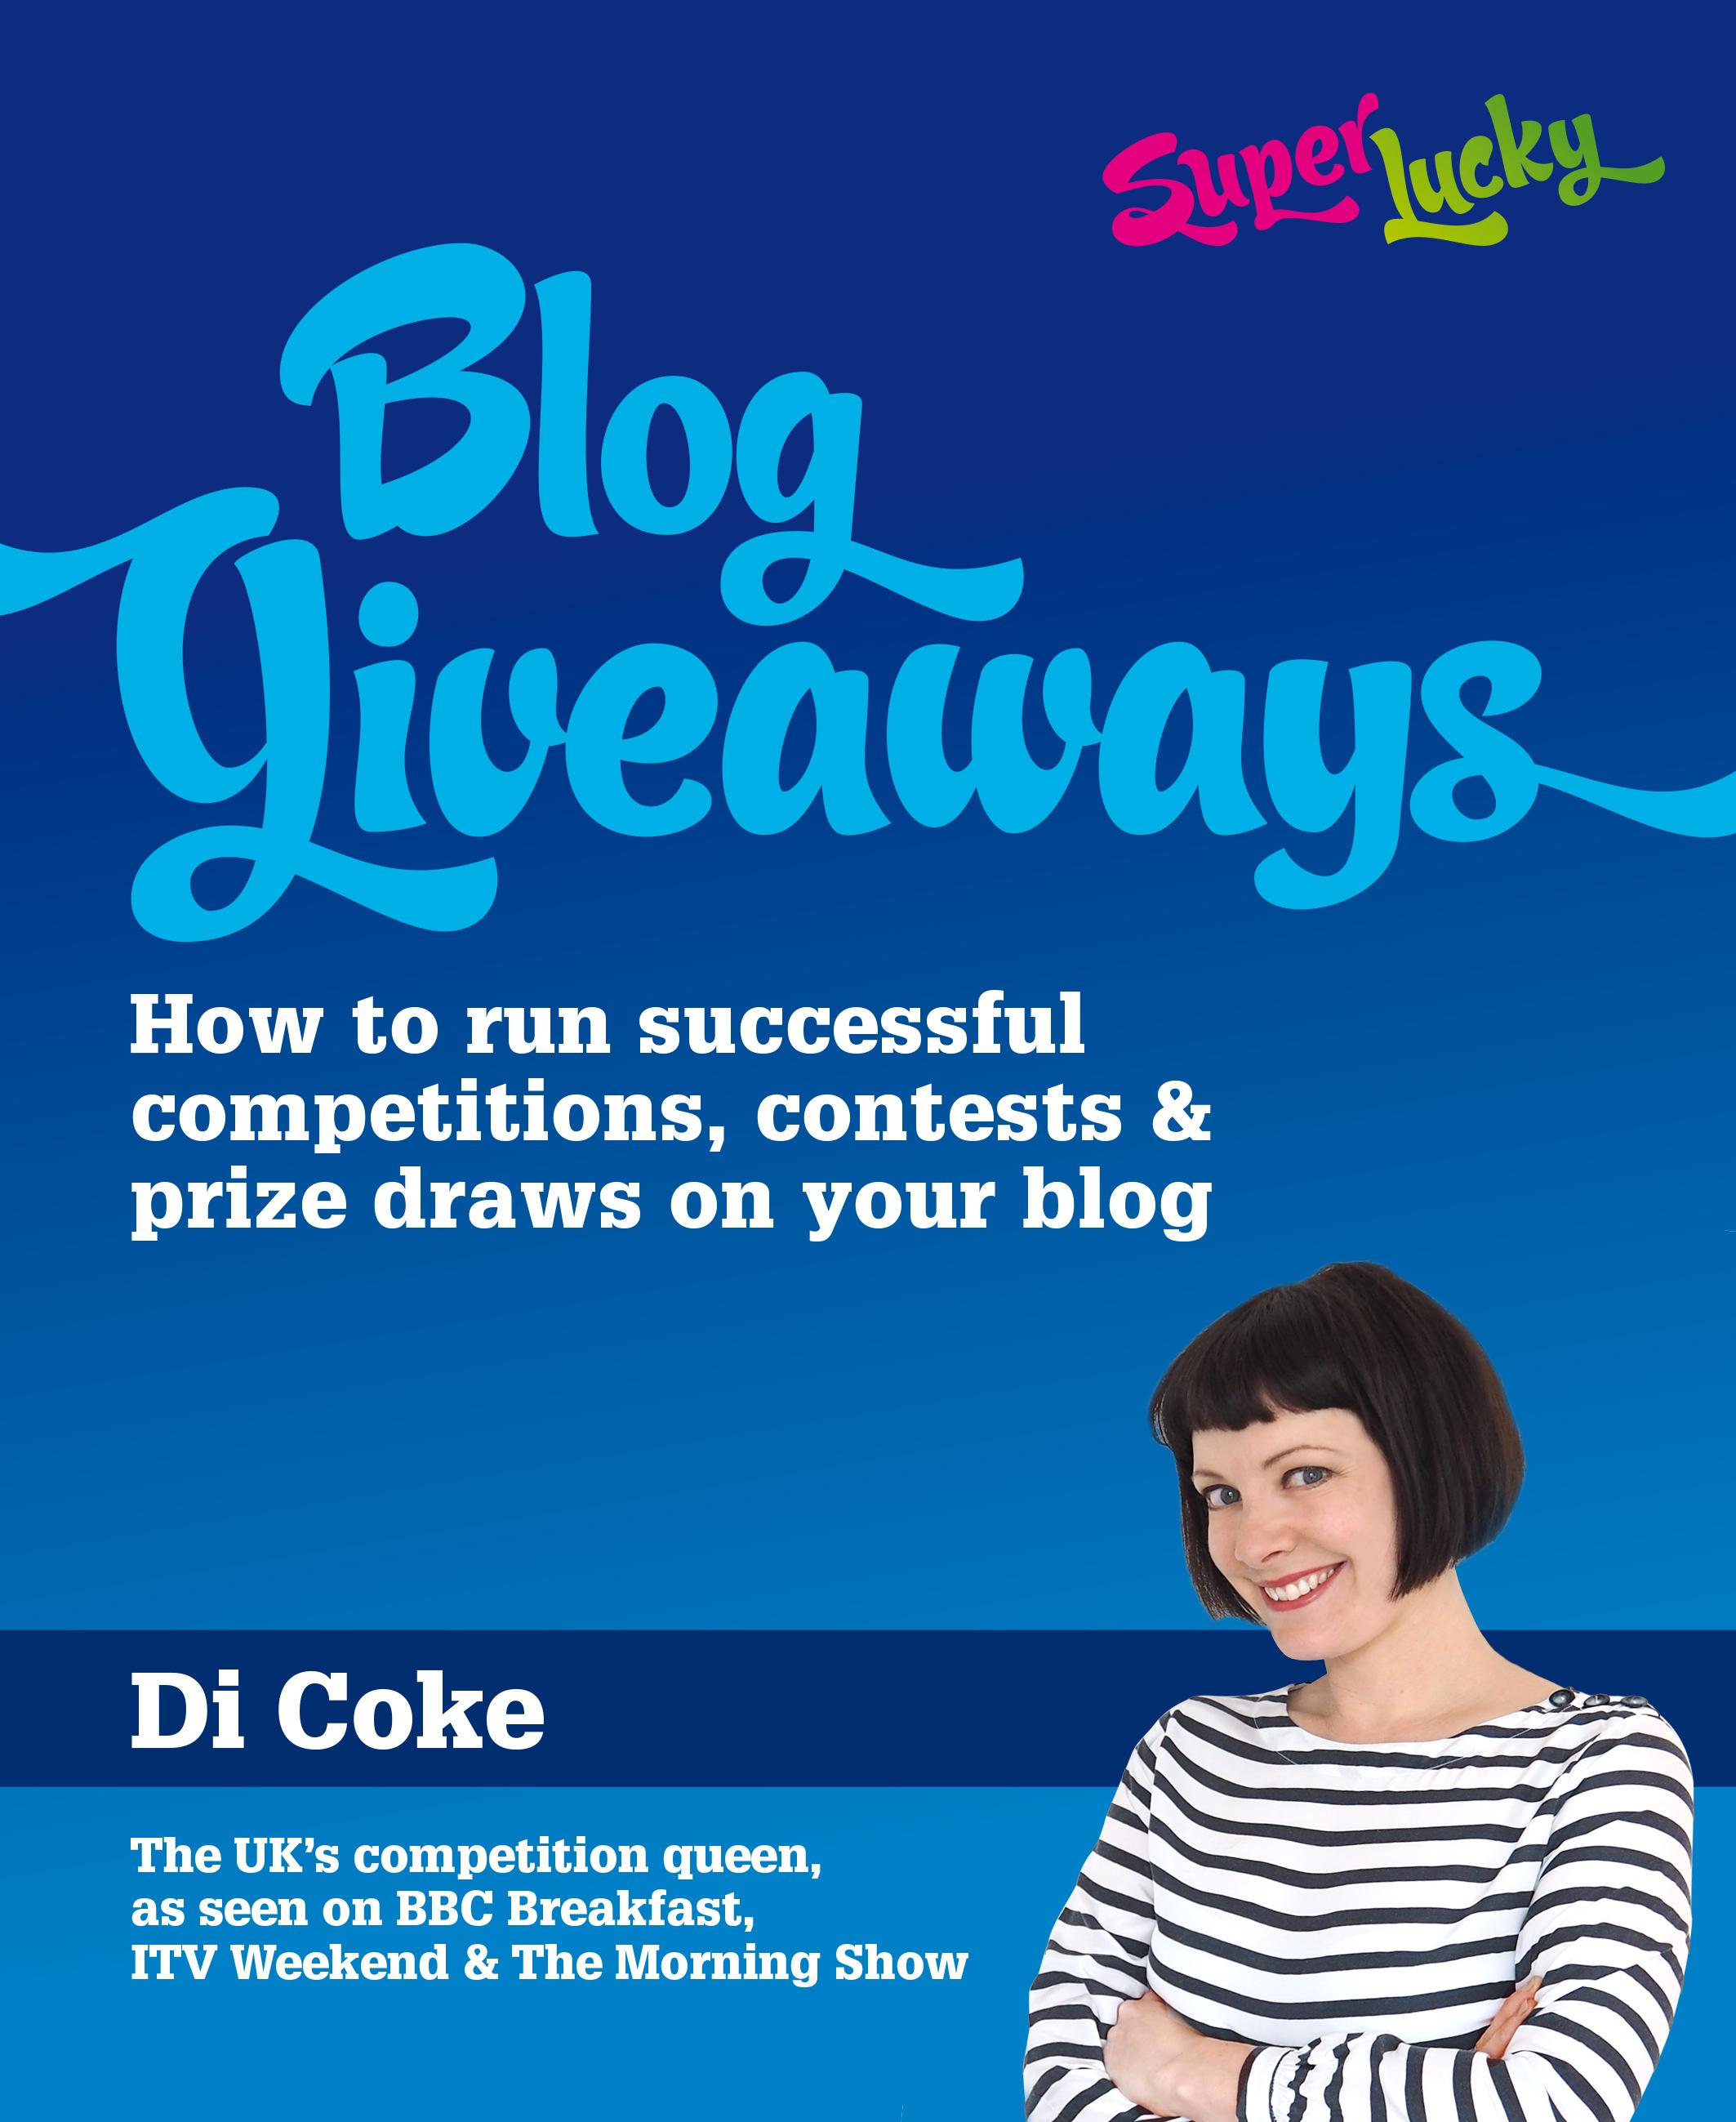 Blog Giveaways | SuperLucky